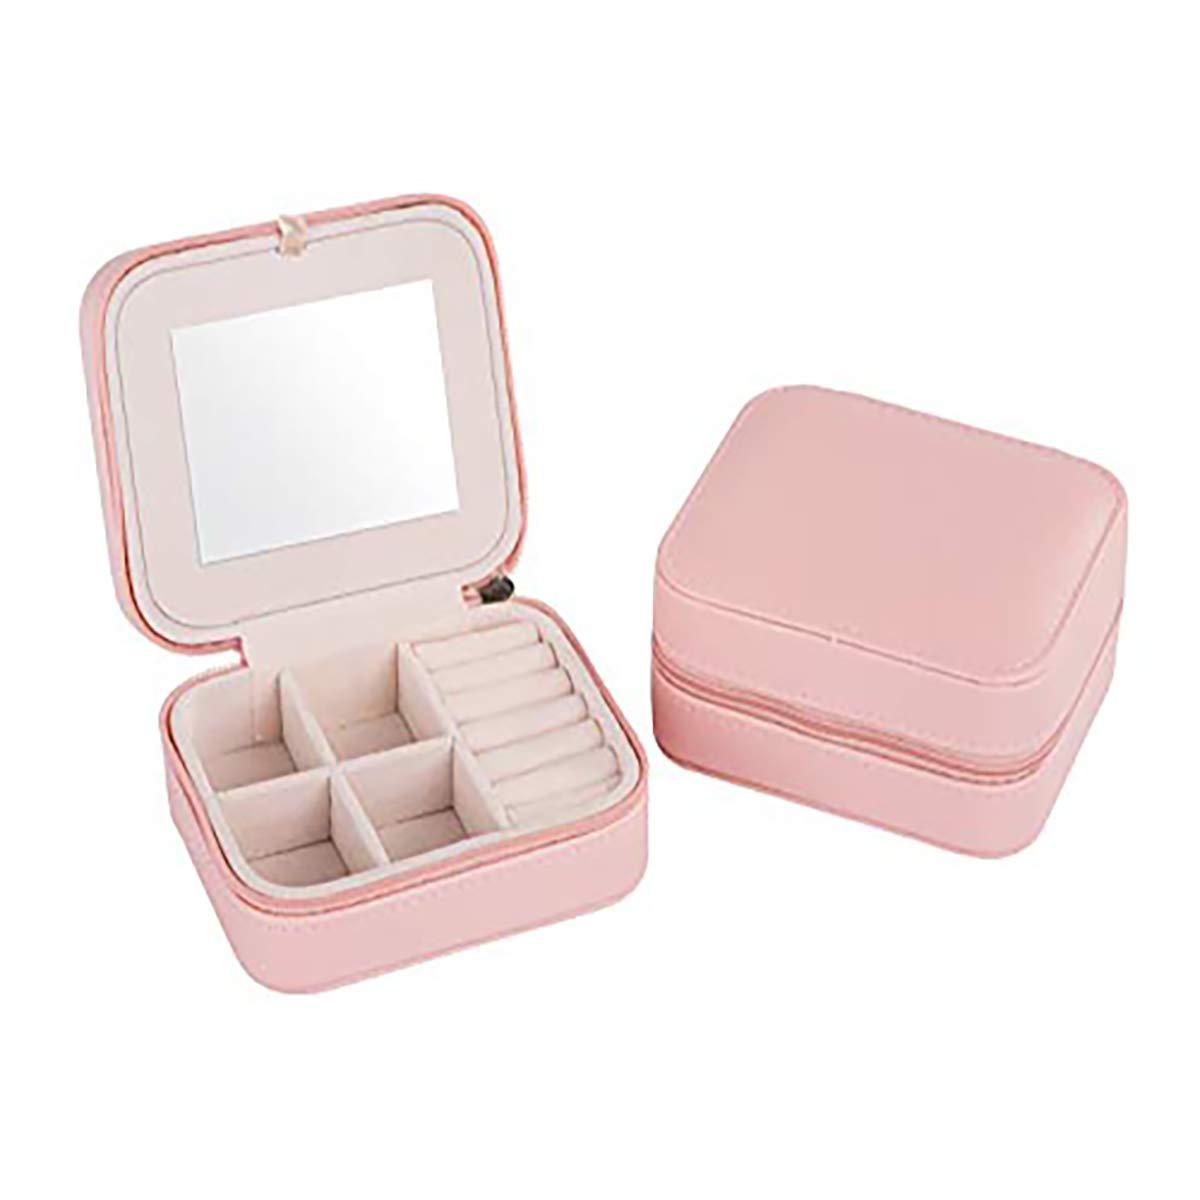 Pequeño joyero de viaje portátil con espejo para anillos, pendientes, collar, pulseras Muhwa eCommerce Co. Ltd J002